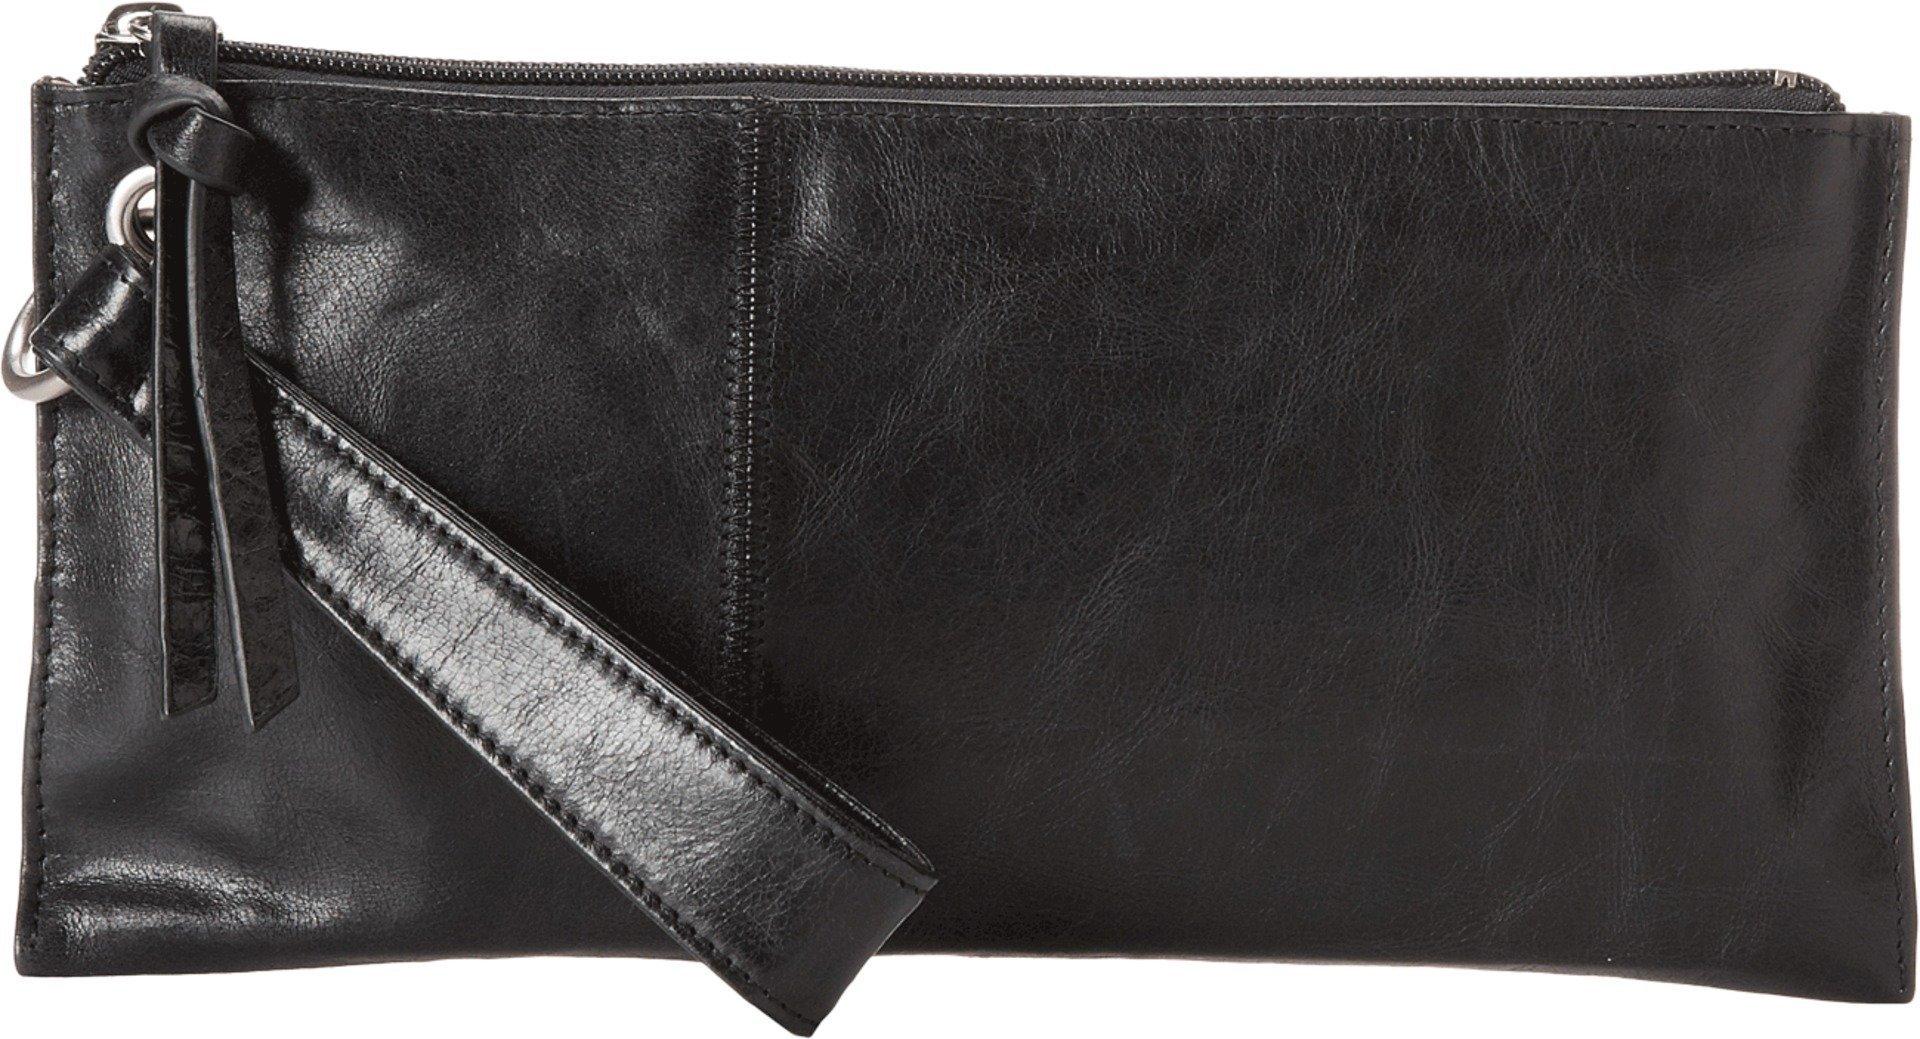 HOBO Vintage Vida Clutch,Black,One Size by HOBO (Image #1)